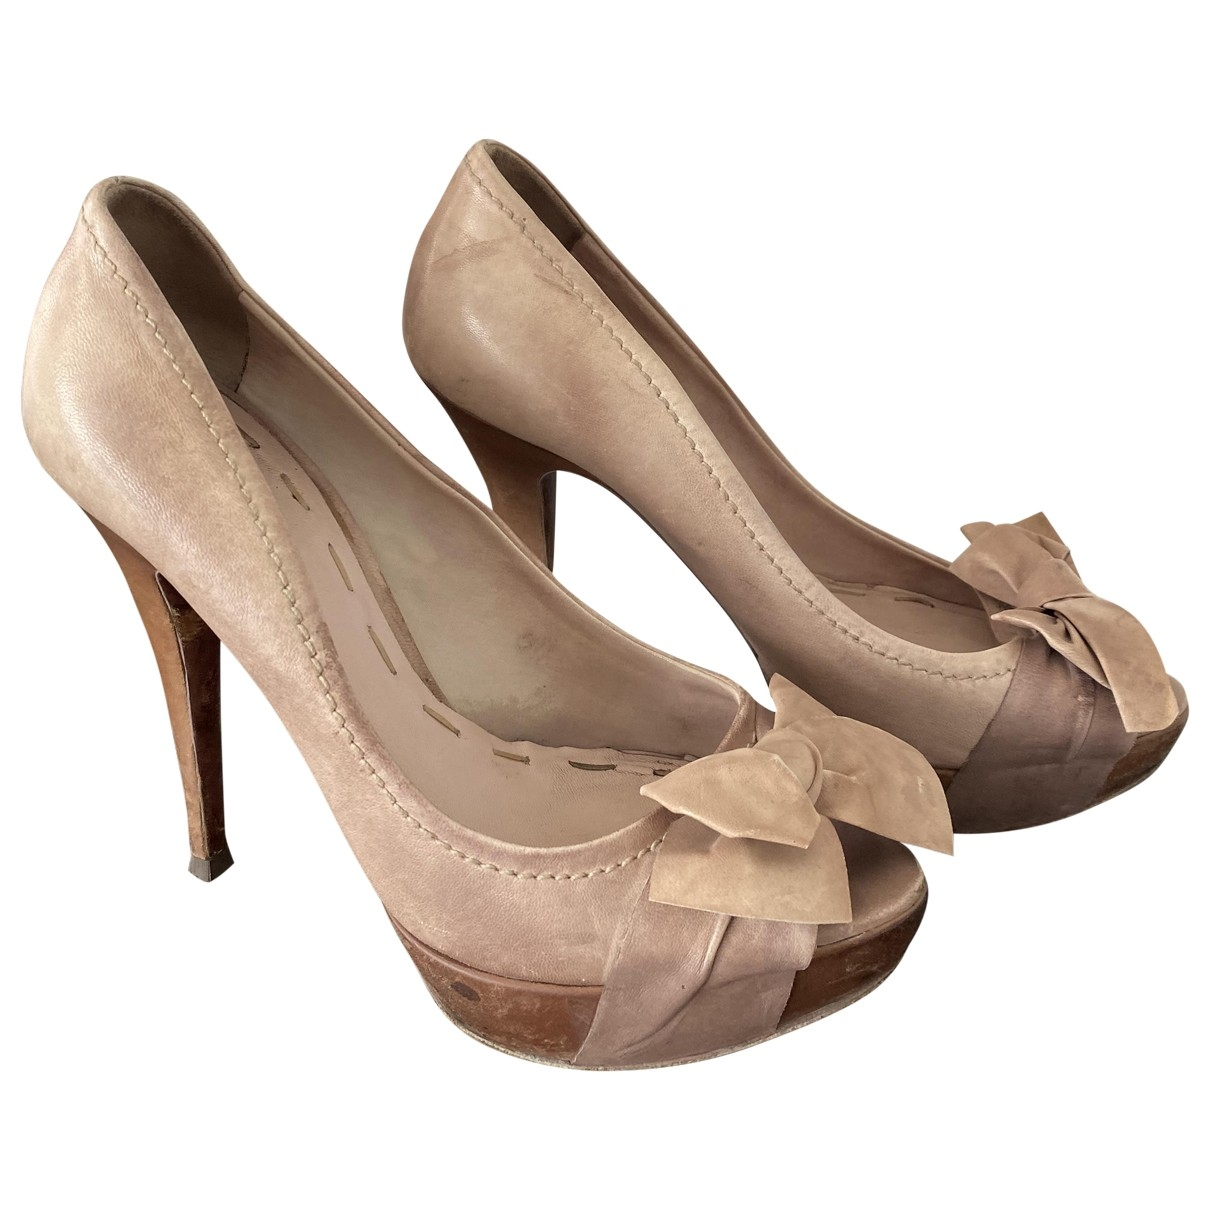 Miu Miu \N Beige Leather Heels for Women 39.5 EU